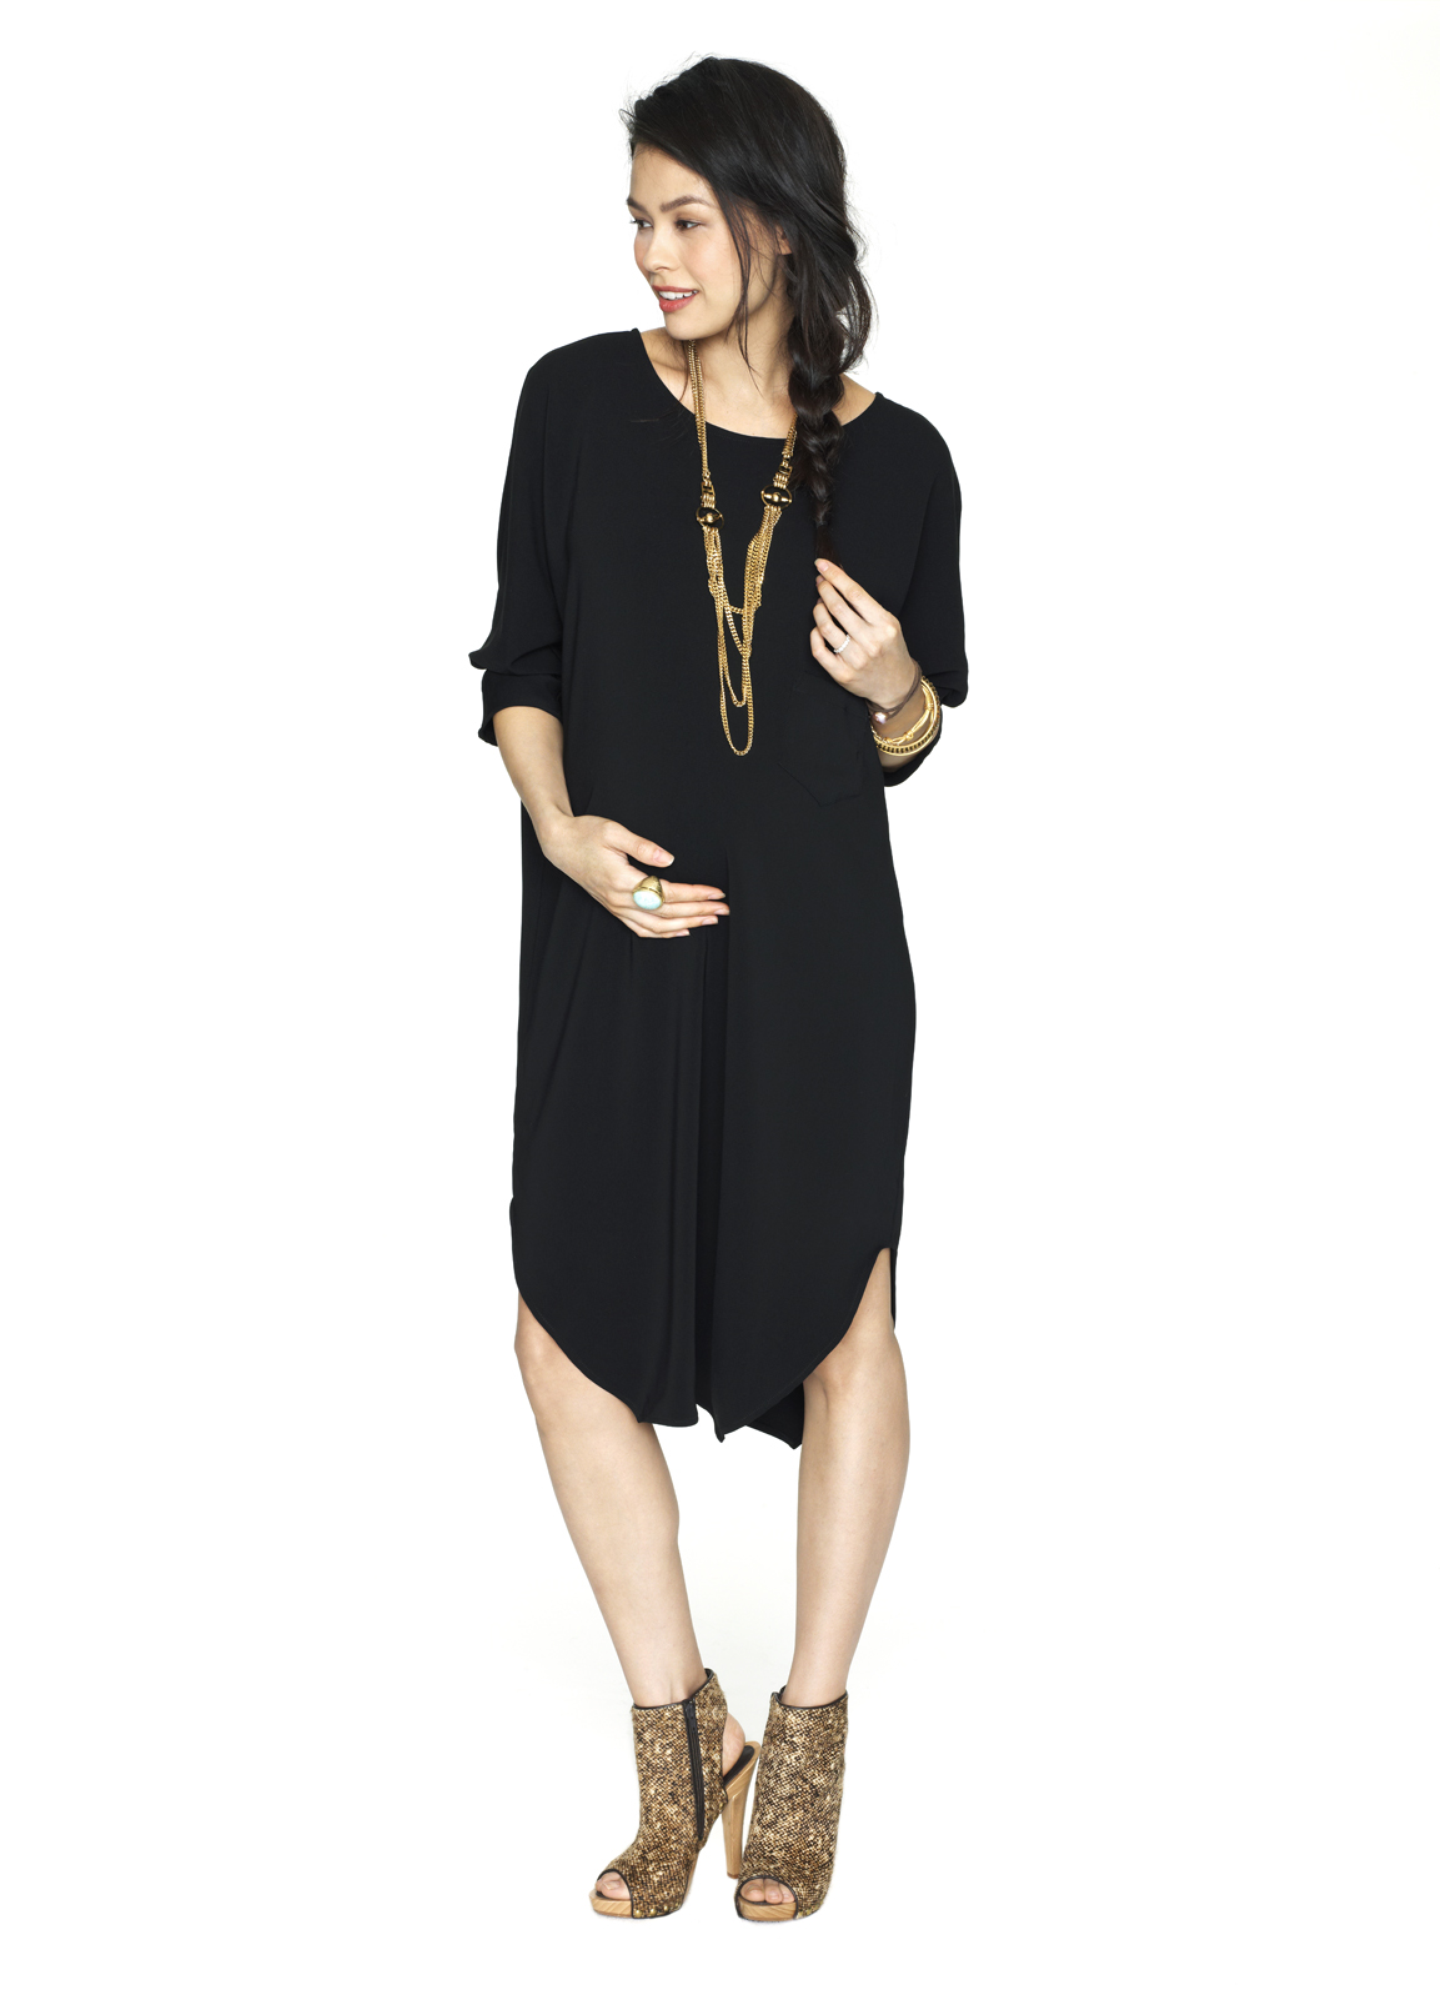 17  images about shirt dresses on Pinterest - Shirtdress- Sleeve ...